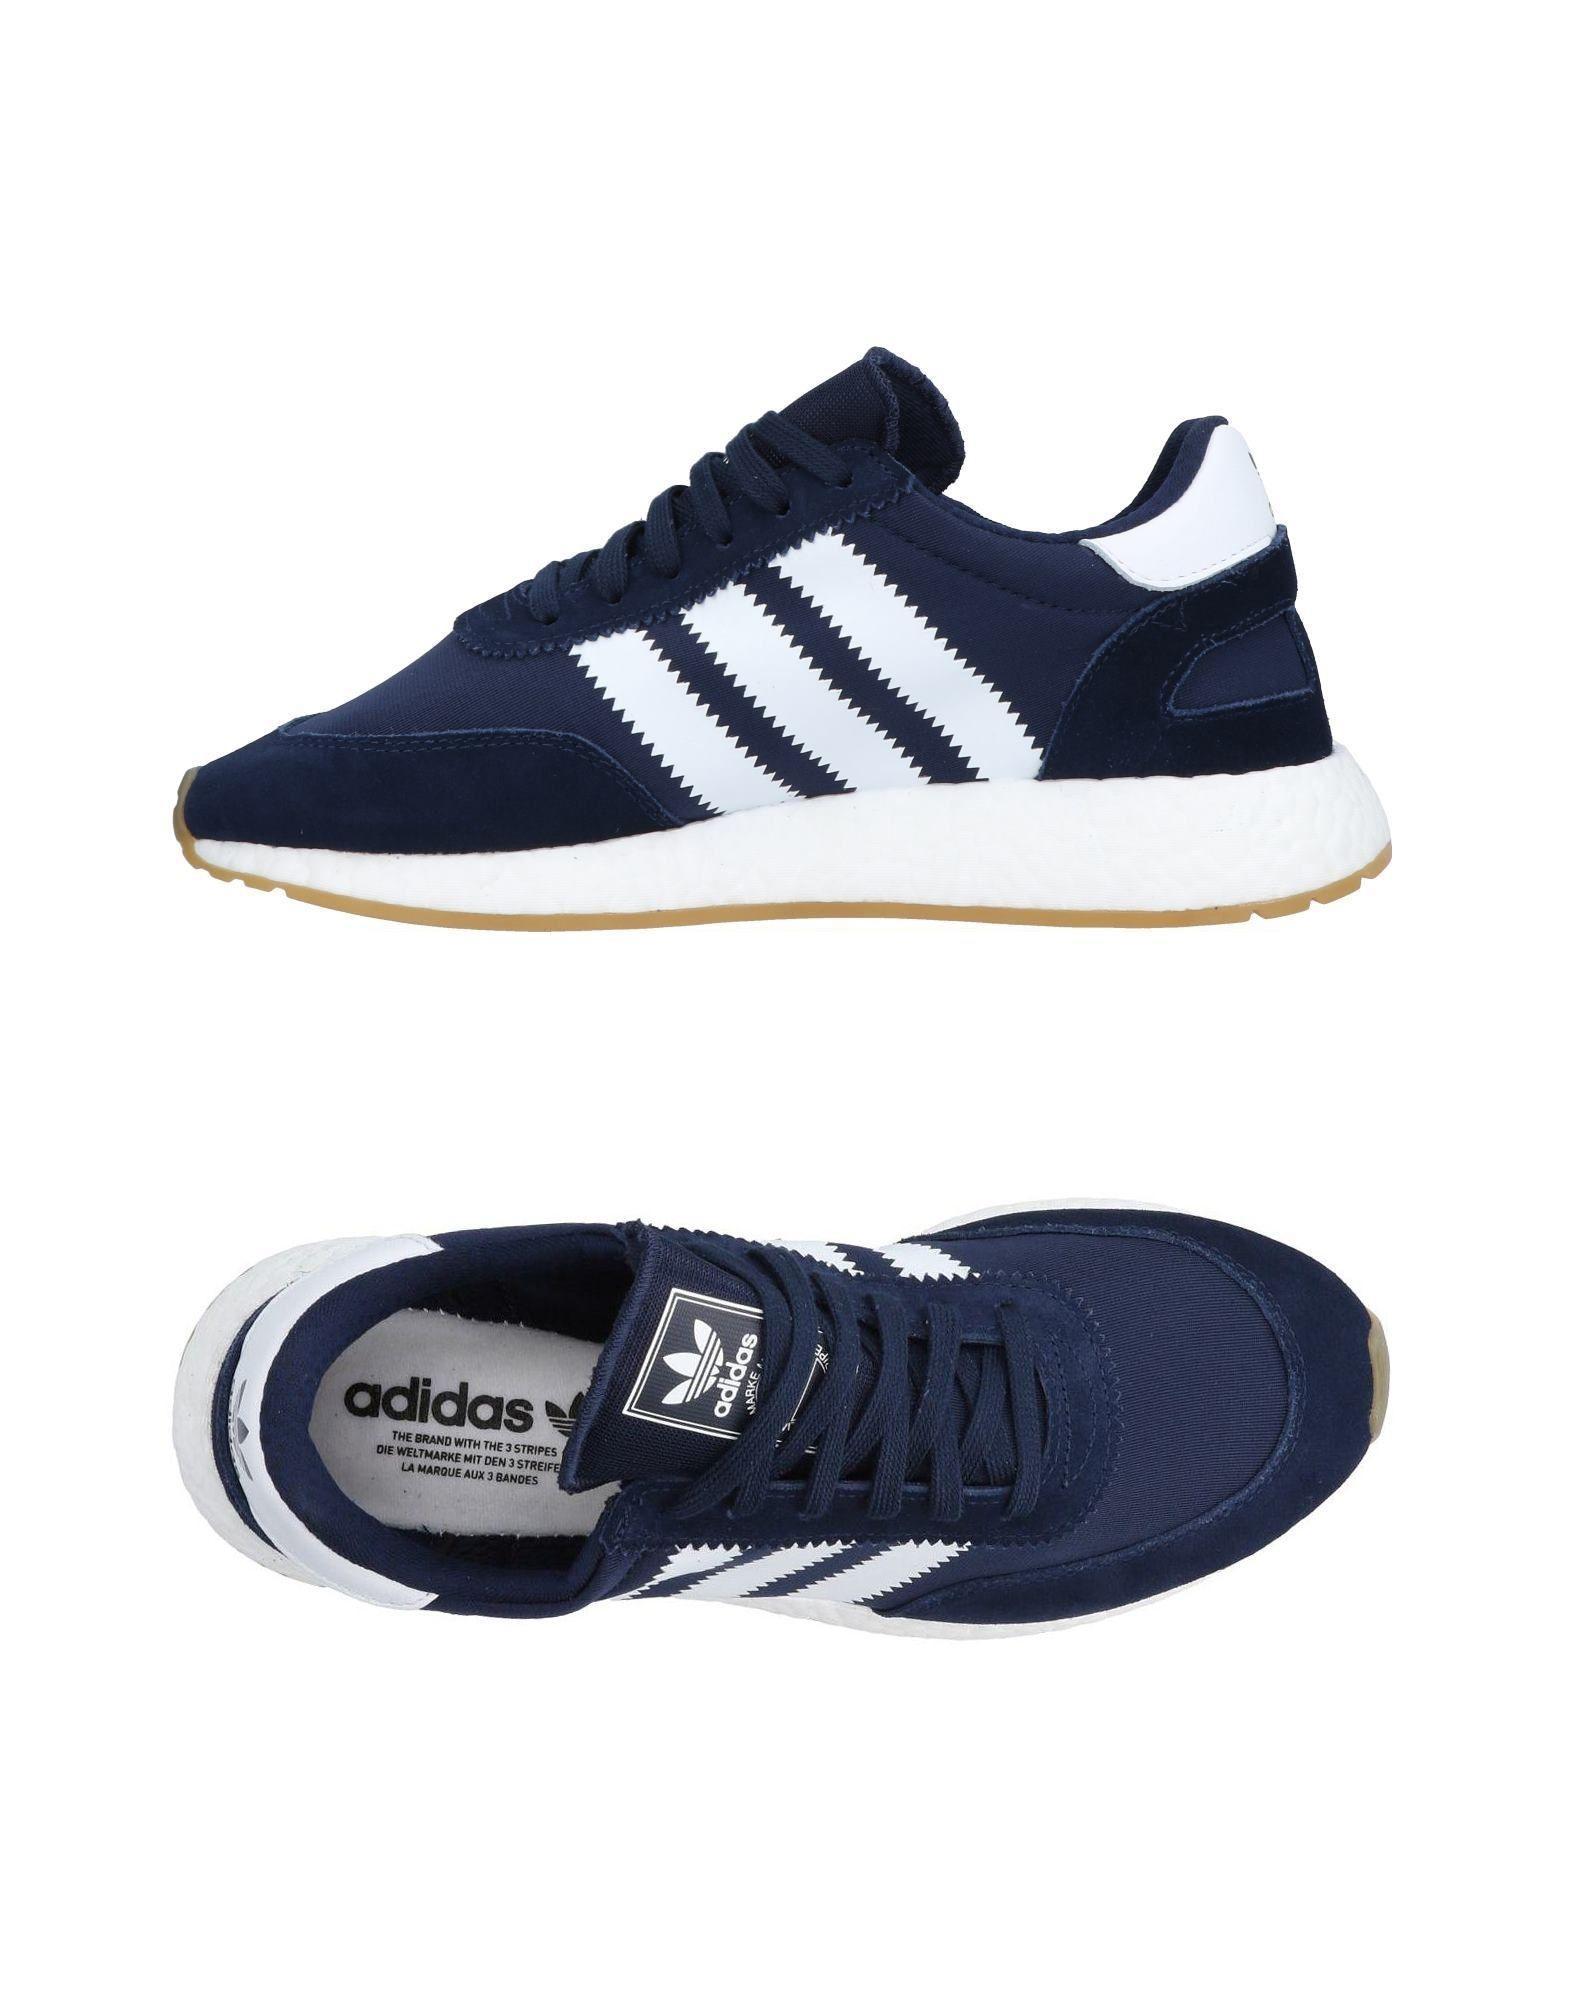 Adidas Originals Sneakers In Dark Blue